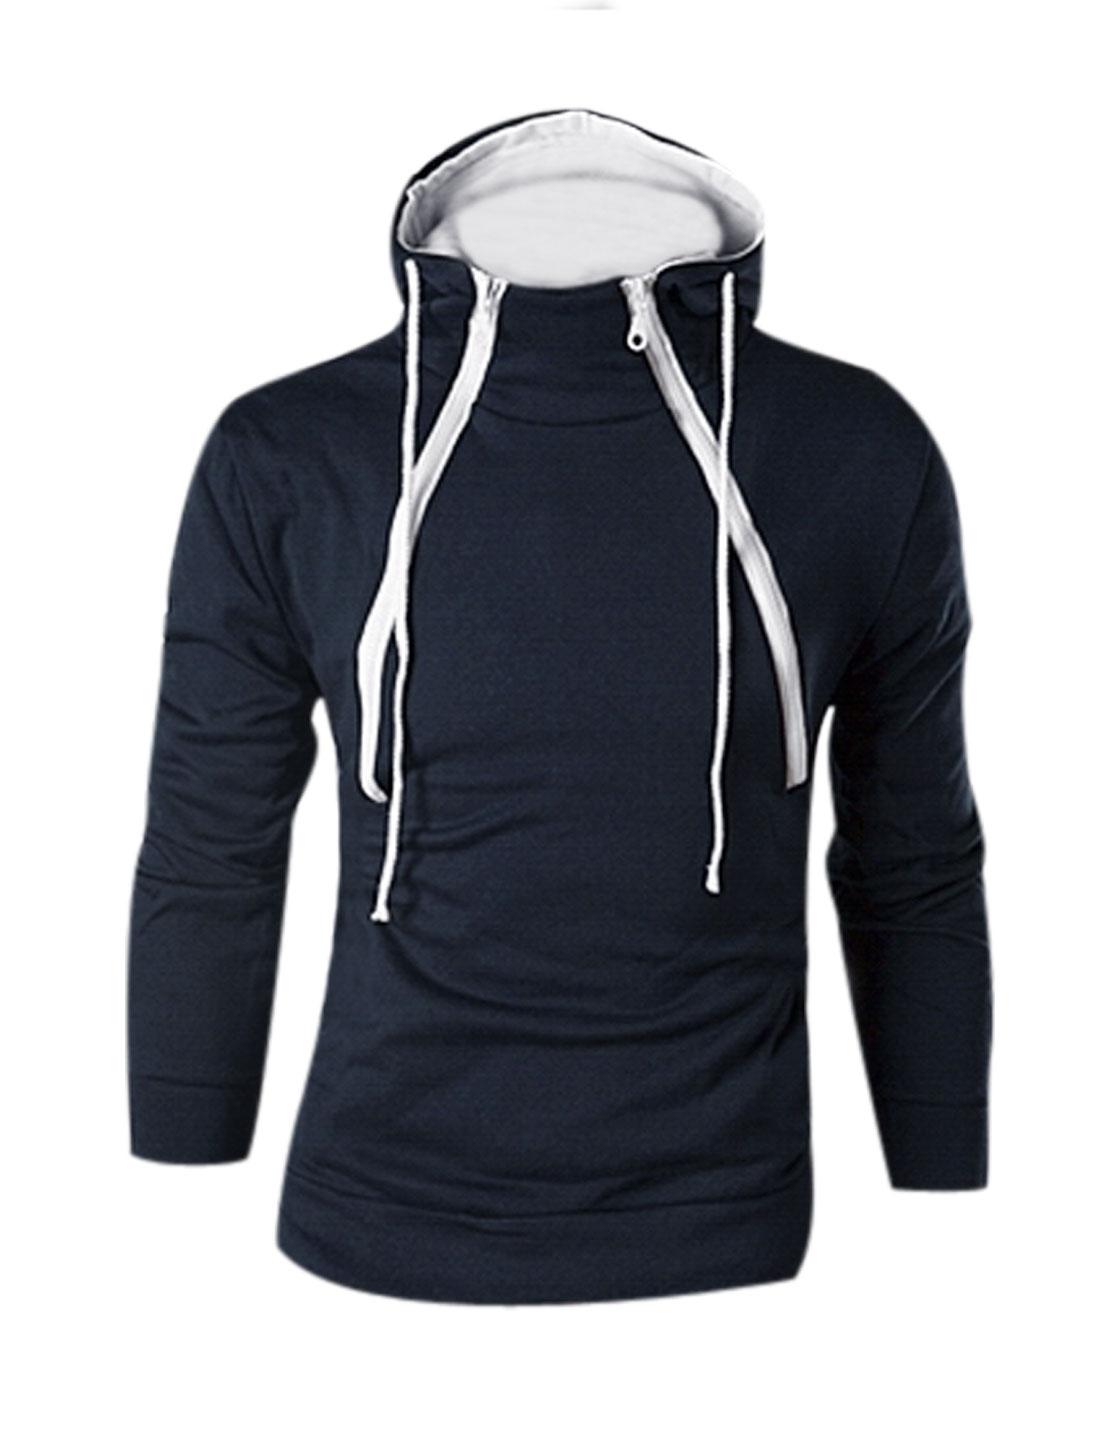 Man Navy Blue Pullover Drawstring Front Pockets Long Sleeves Hooded Sweatshirt M